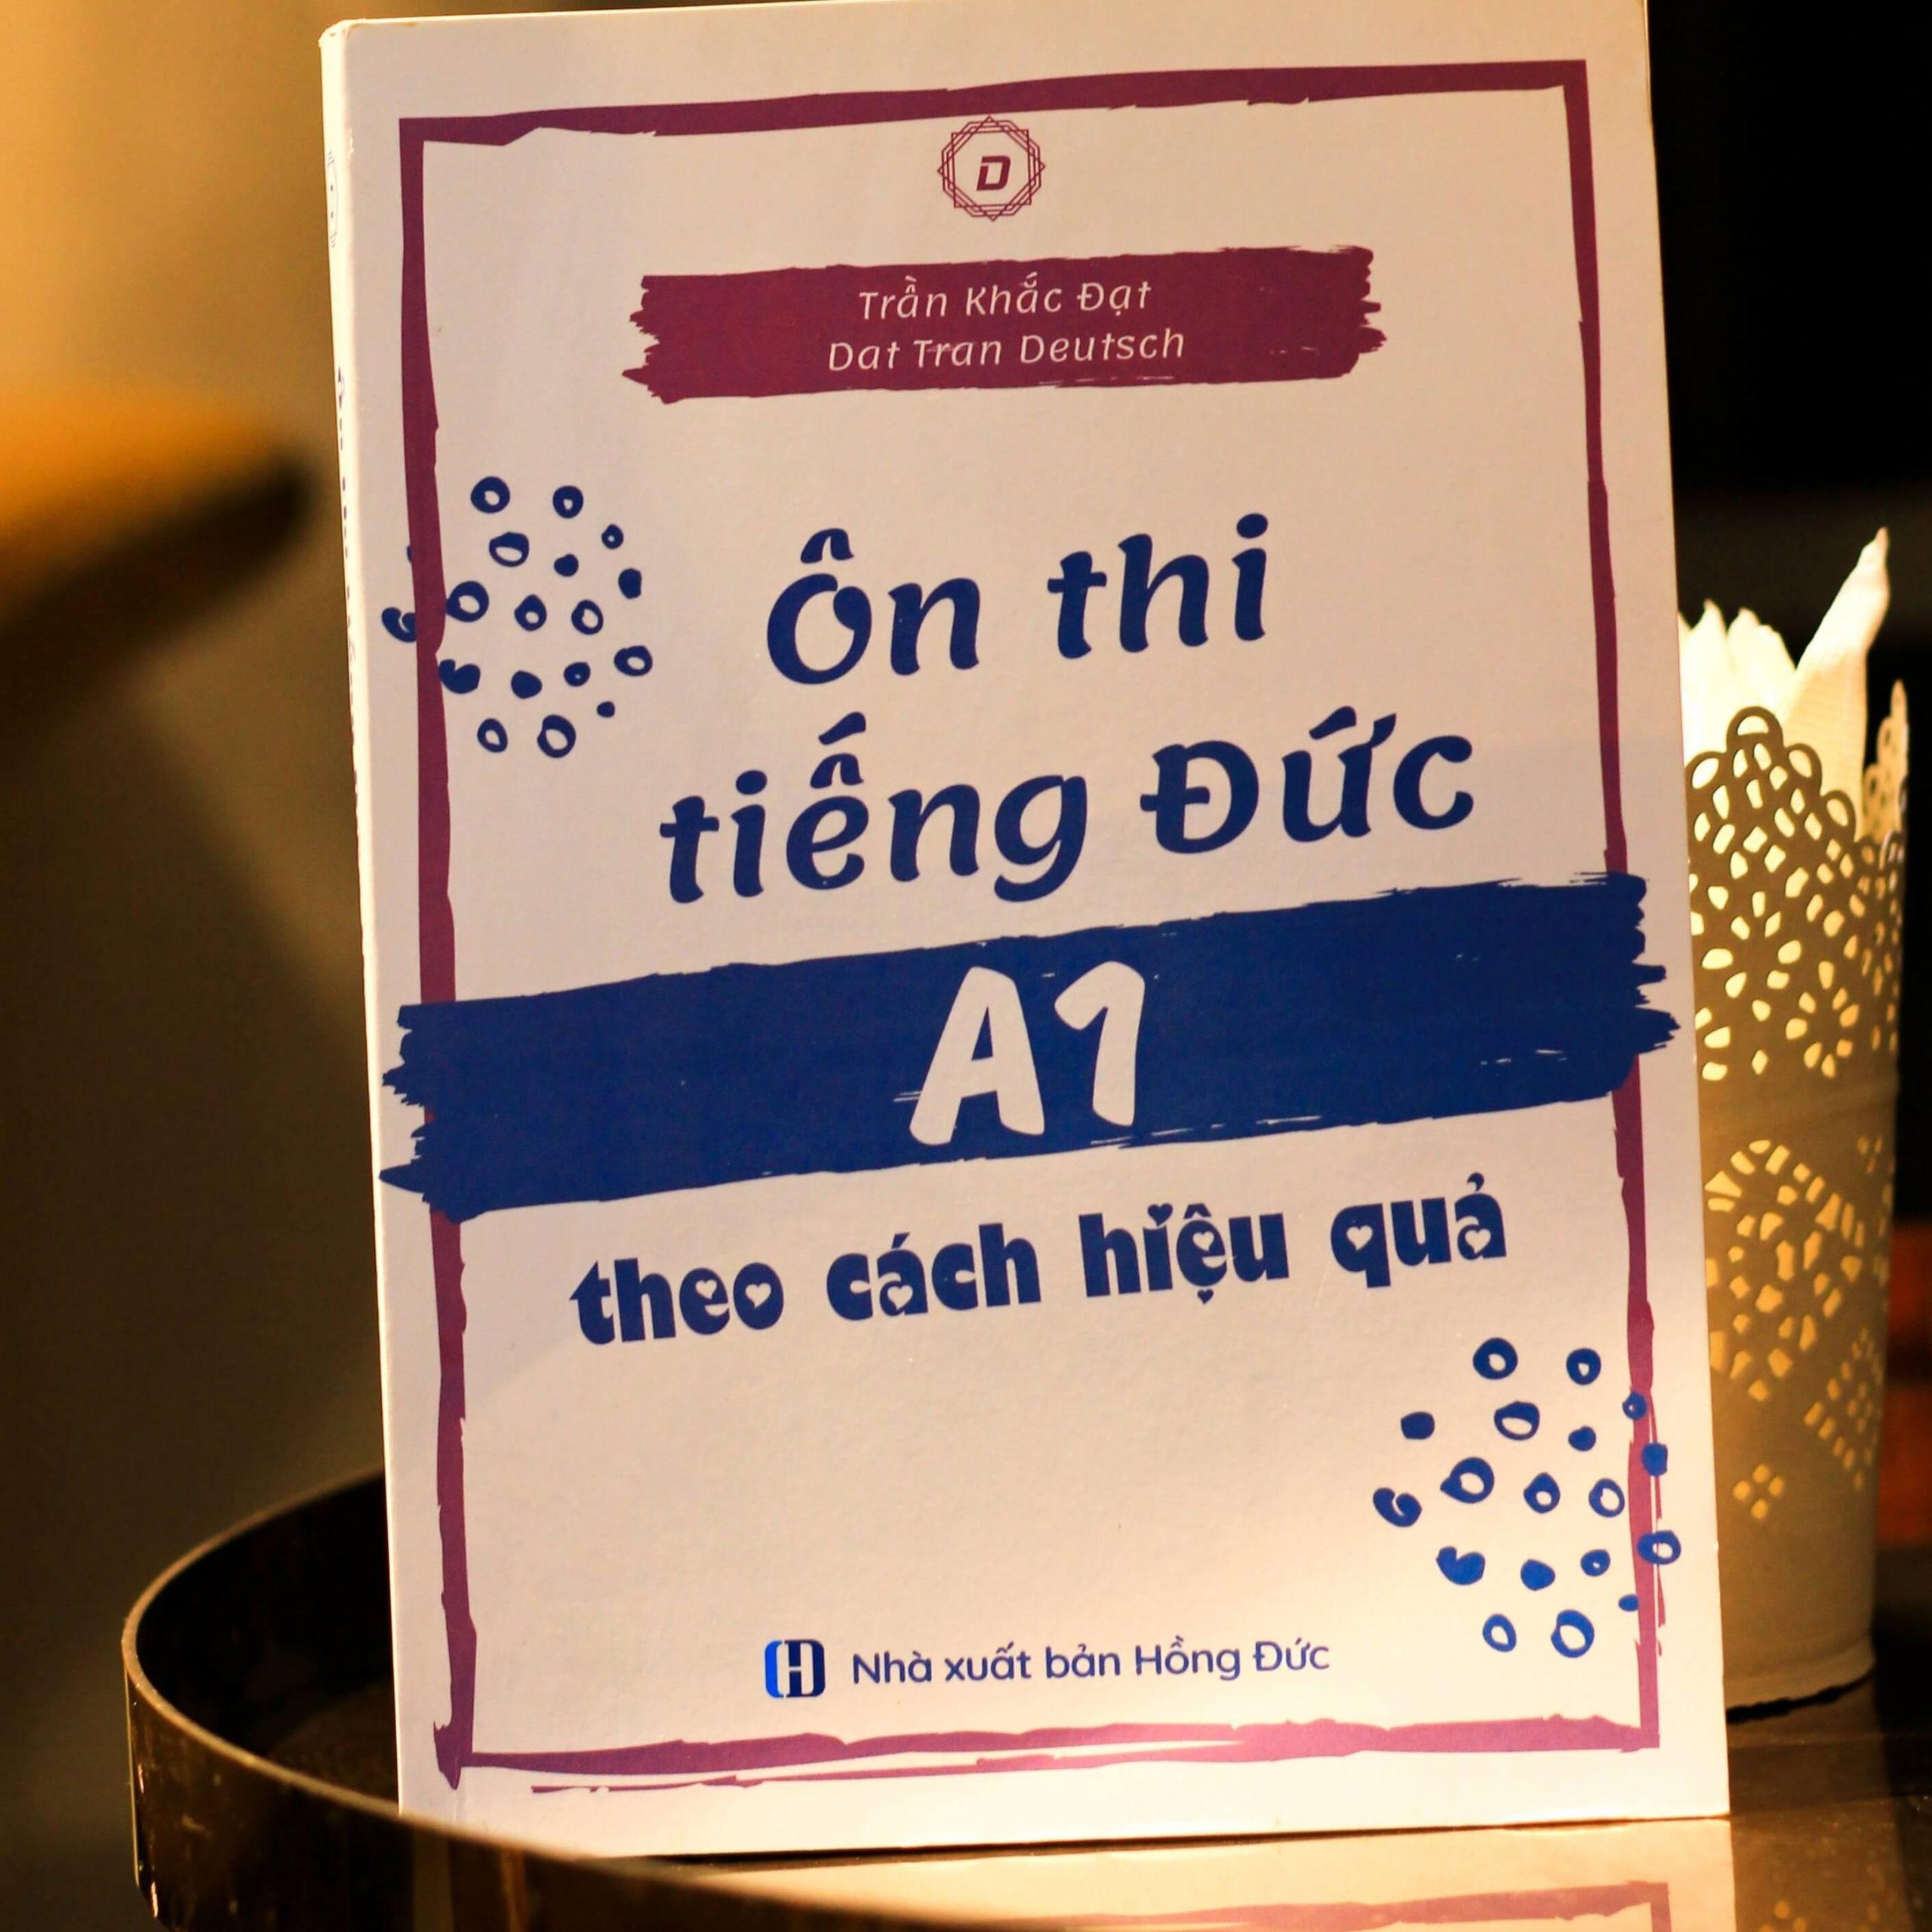 sach-on-thi-tieng-duc-theo-cach-hieu-qua-dattrandeutsch-2020-scaled.jpg